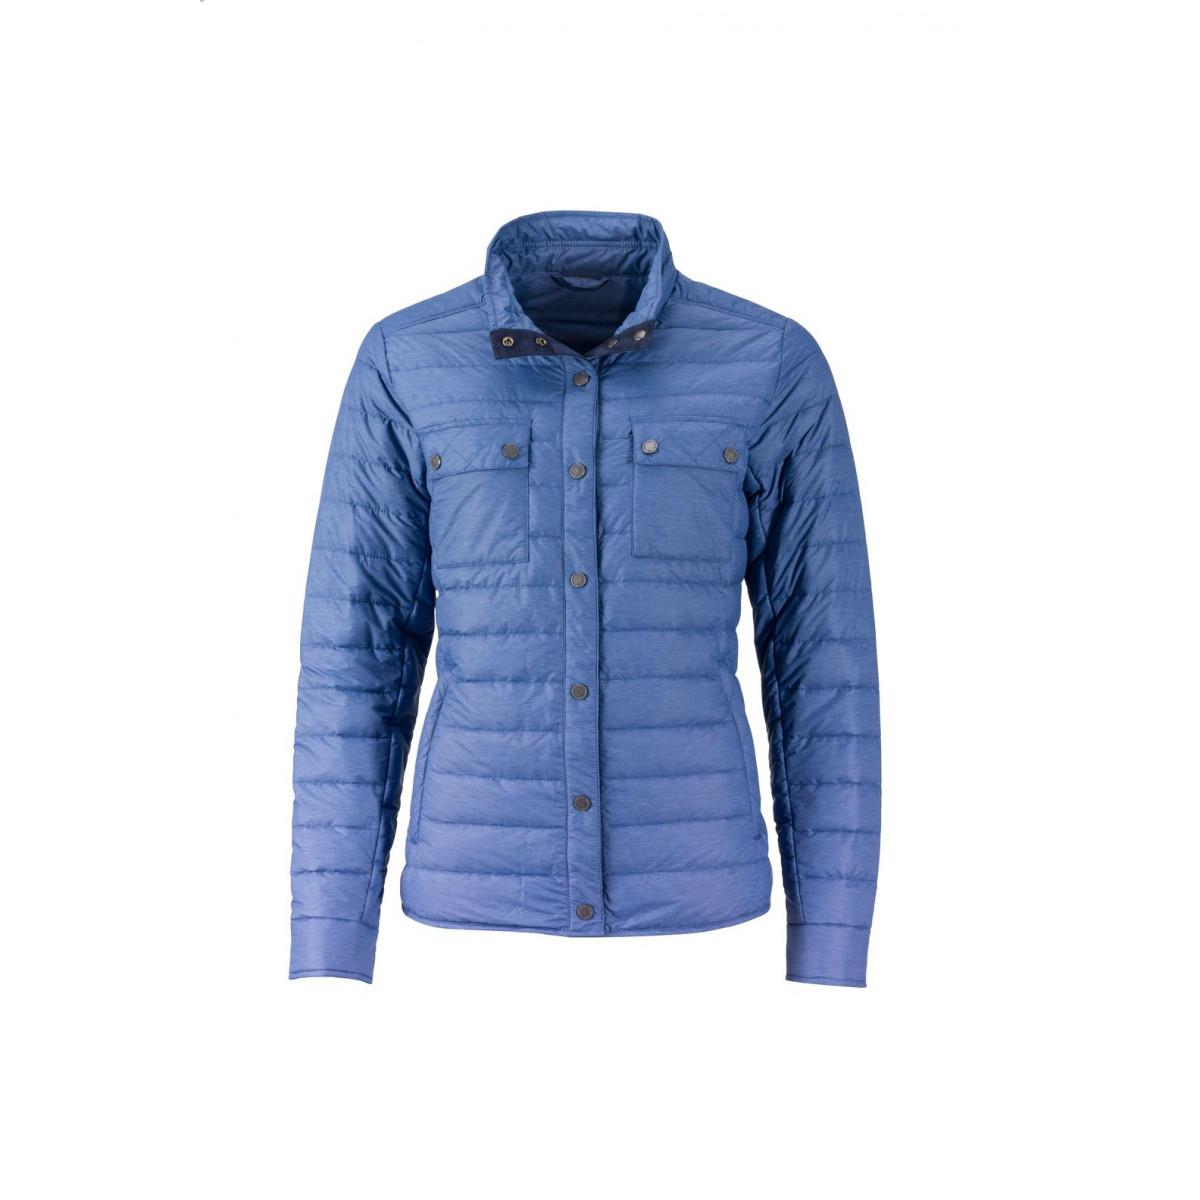 Куртка женская JN1105 Ladies Lightweight Down Jacket - Джинс меланж